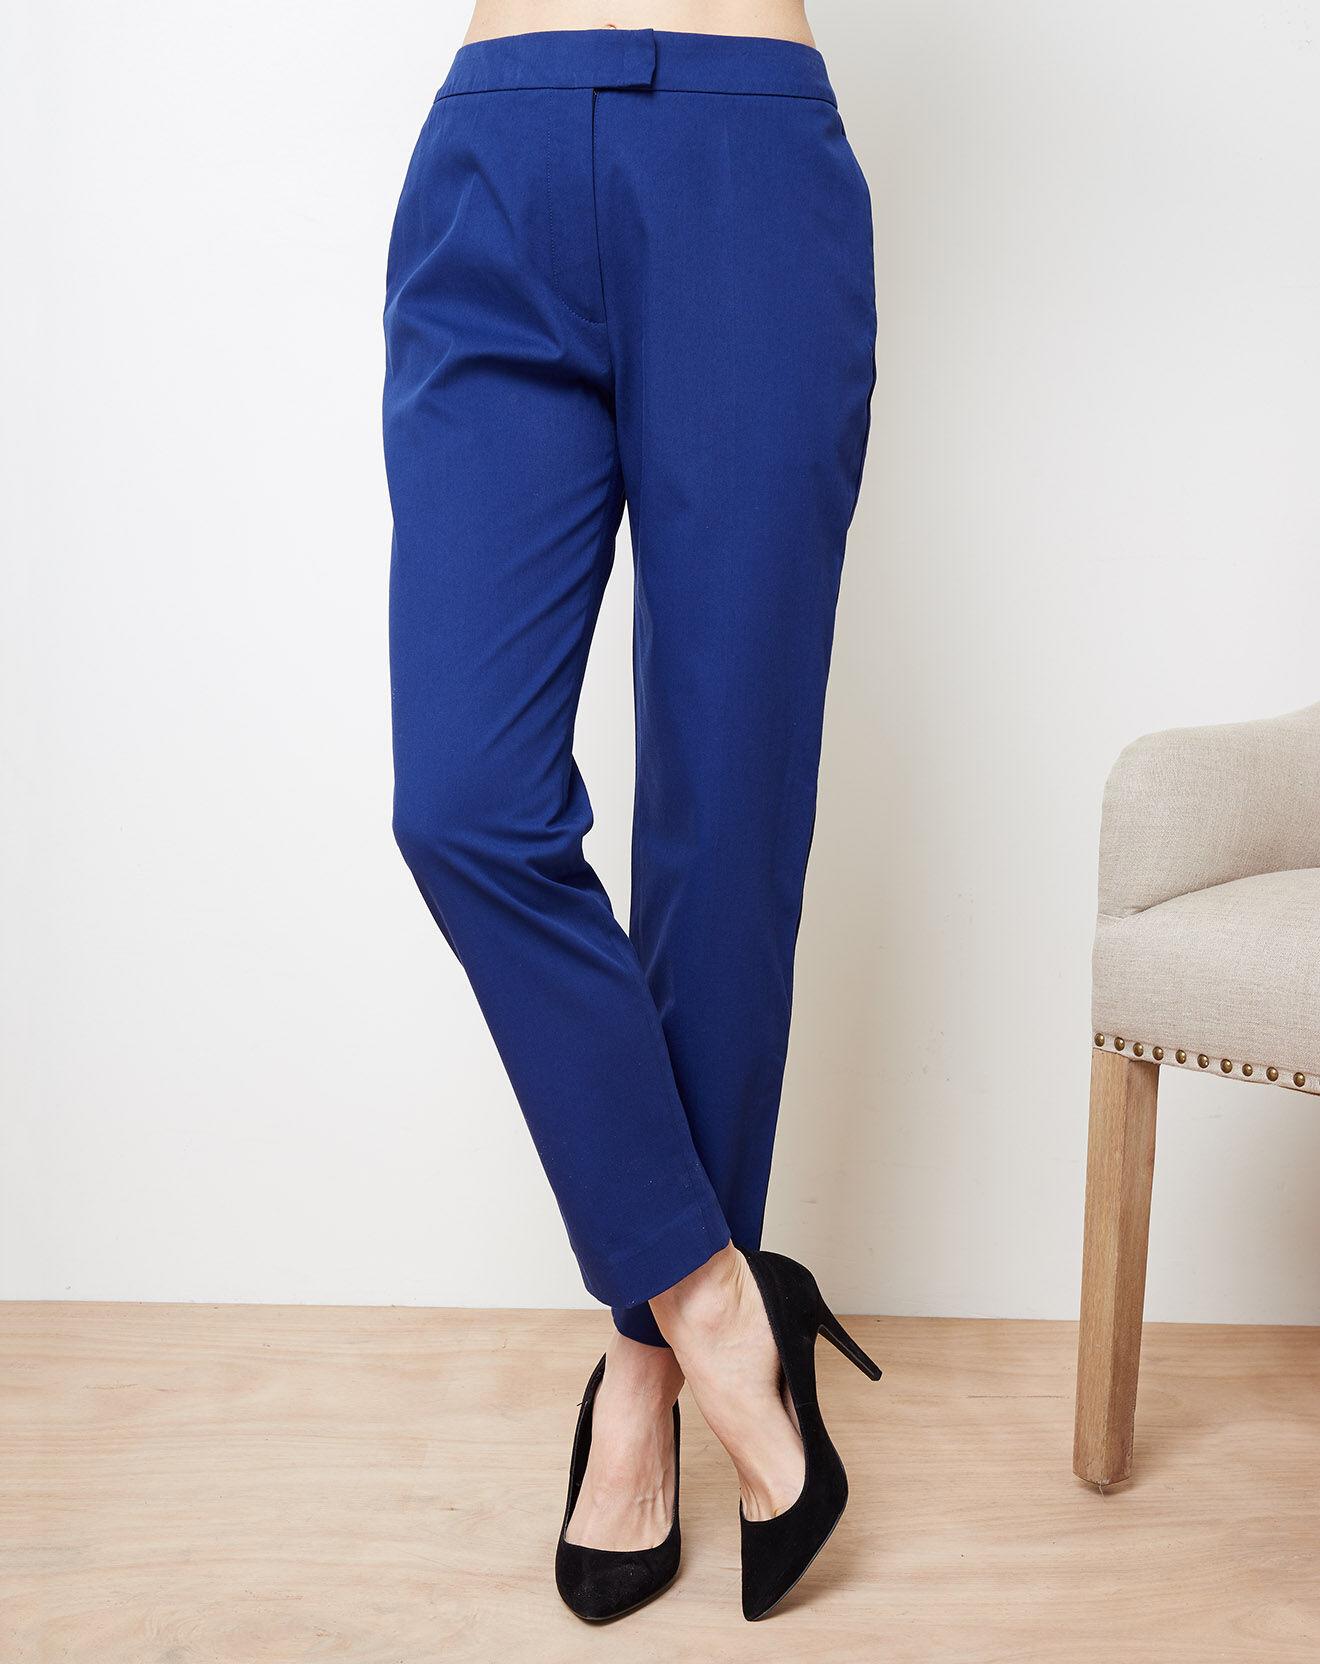 Pantalon cigarette bleu marine - Cacharel - Modalova